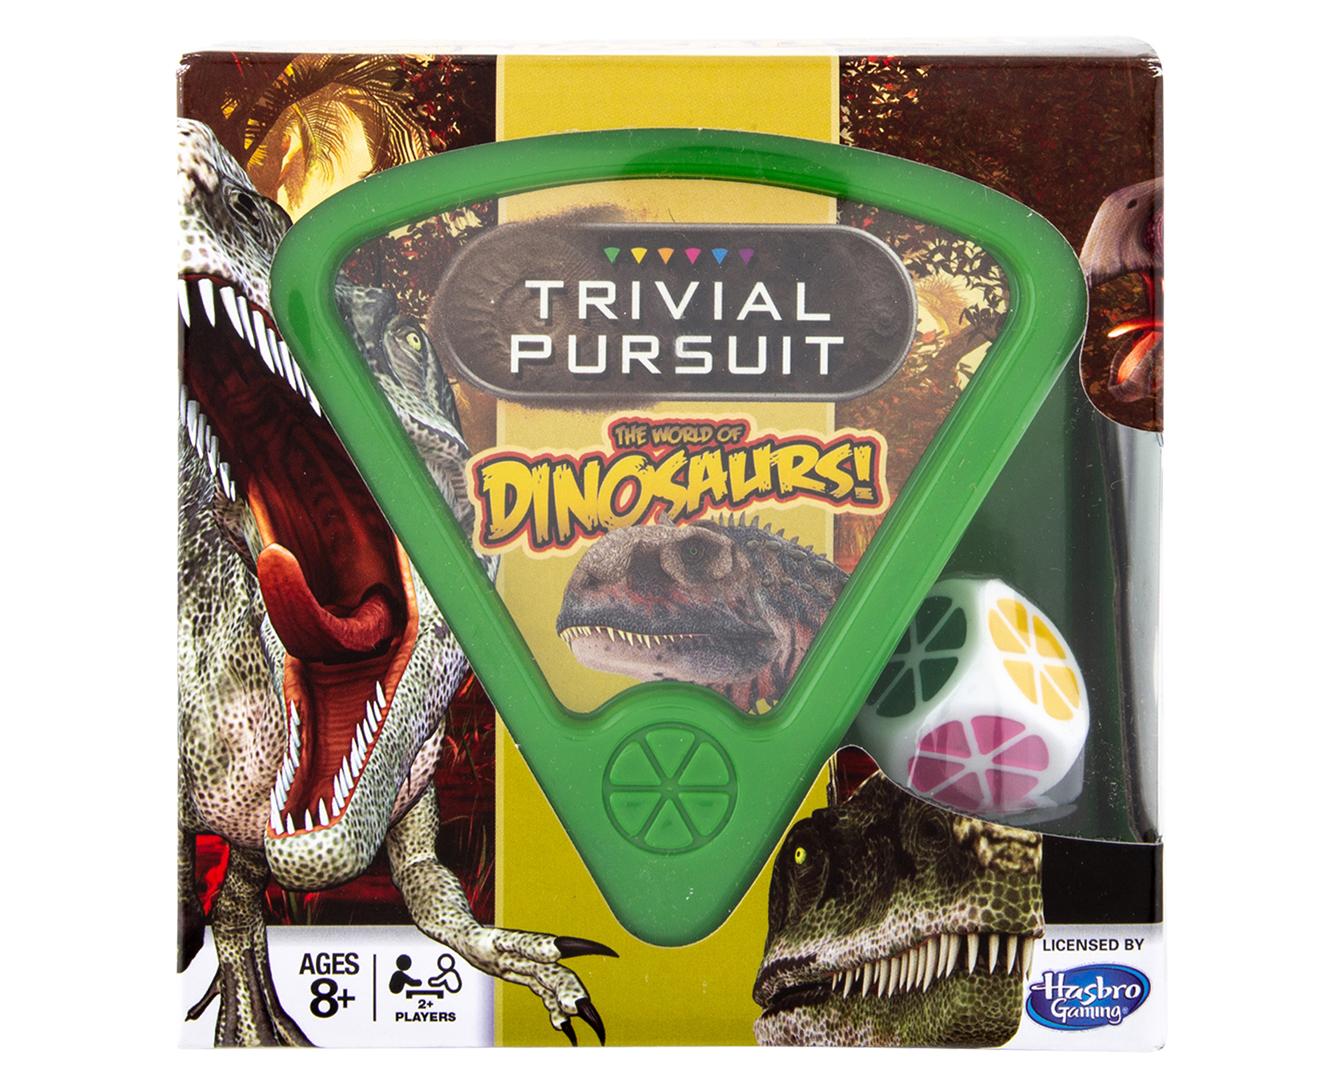 Dinosaurs Trivial Pursuit Game